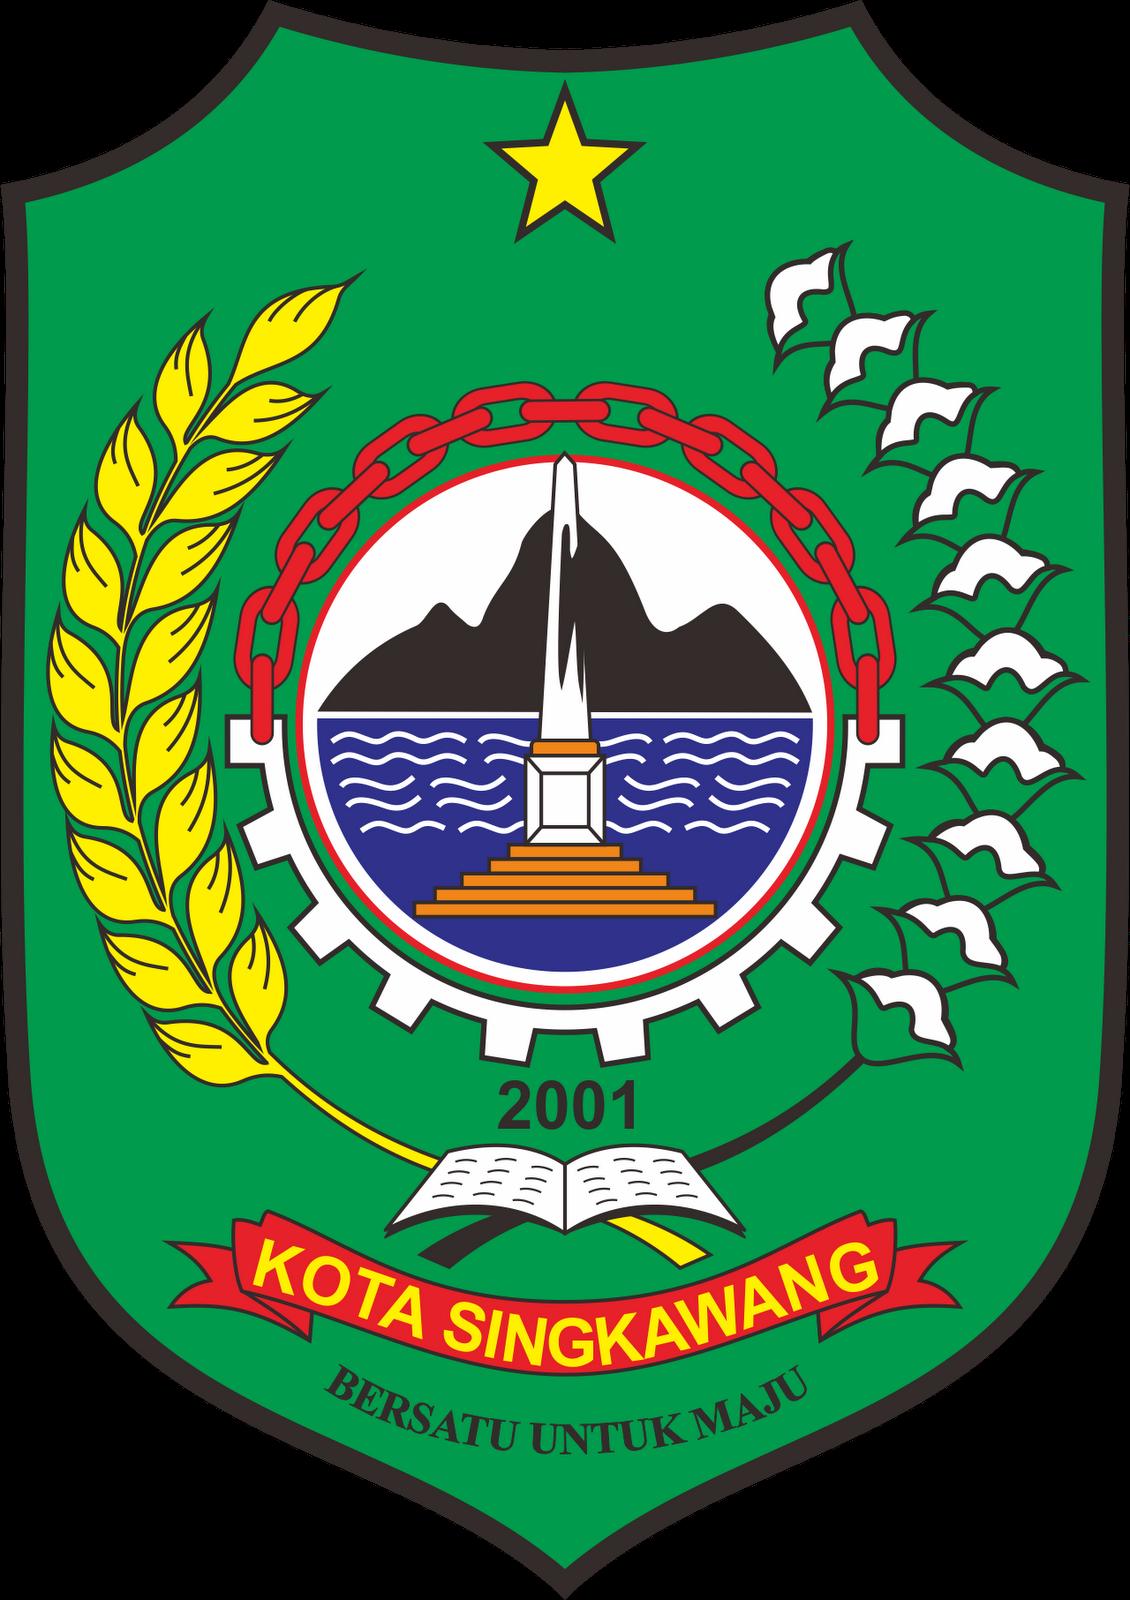 File Lambang Kotasingkawang Png Wikipedia